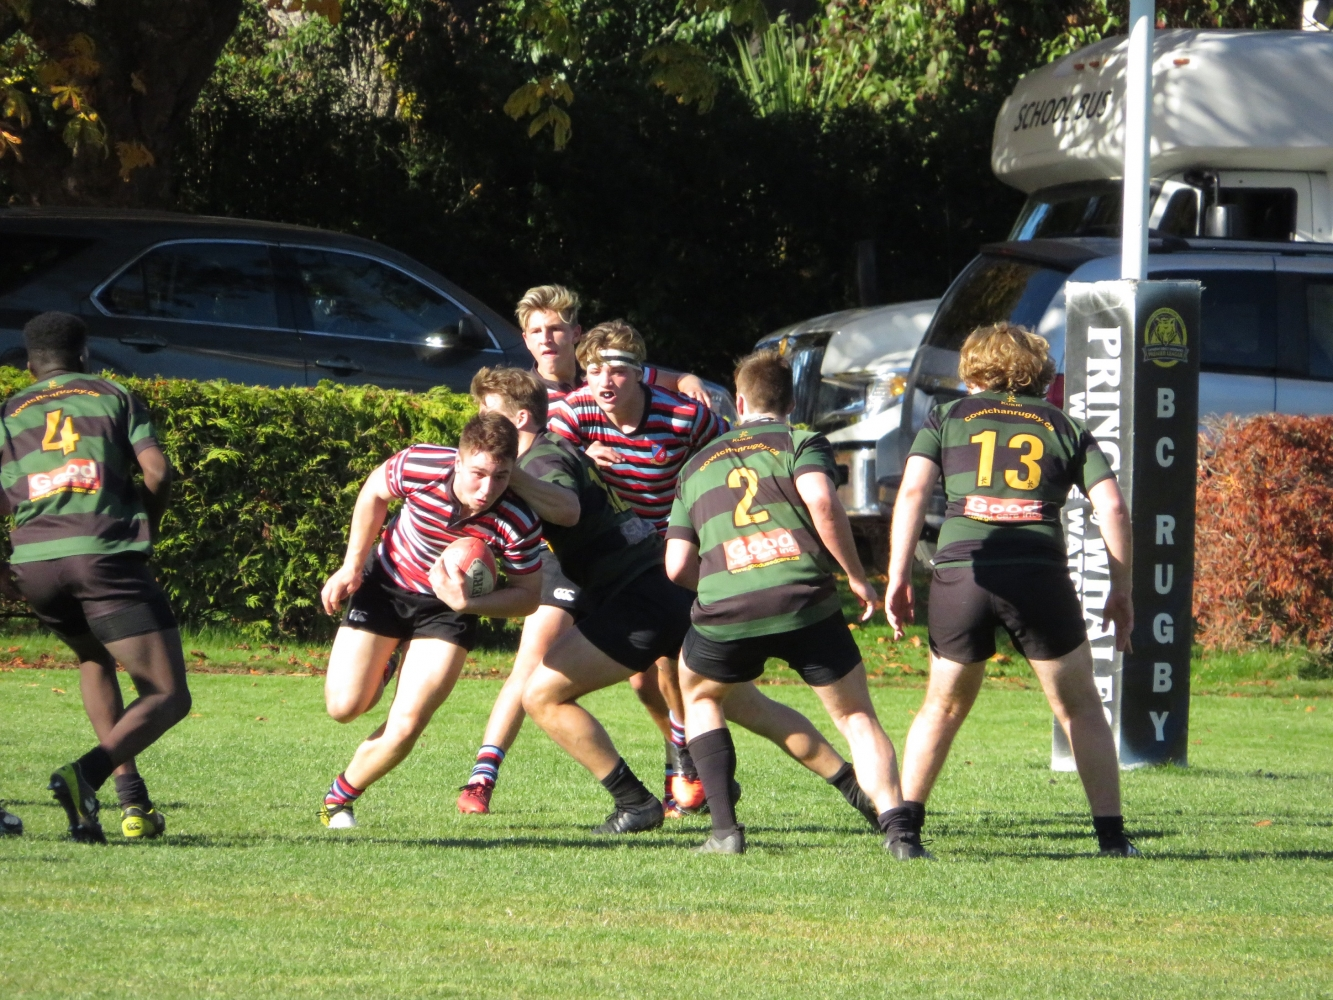 U19 Men - GAME OFF